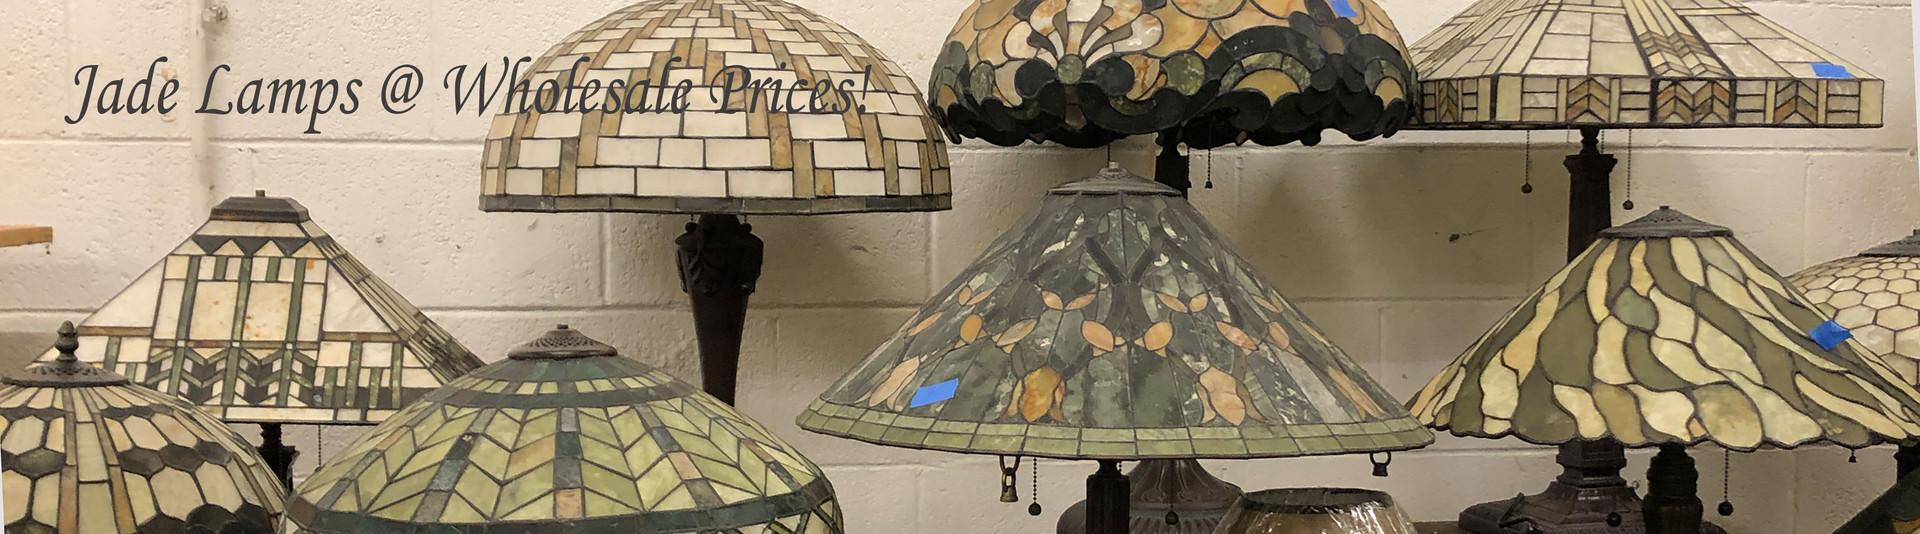 banner-jade-Lamps-wholesale-prices.jpg